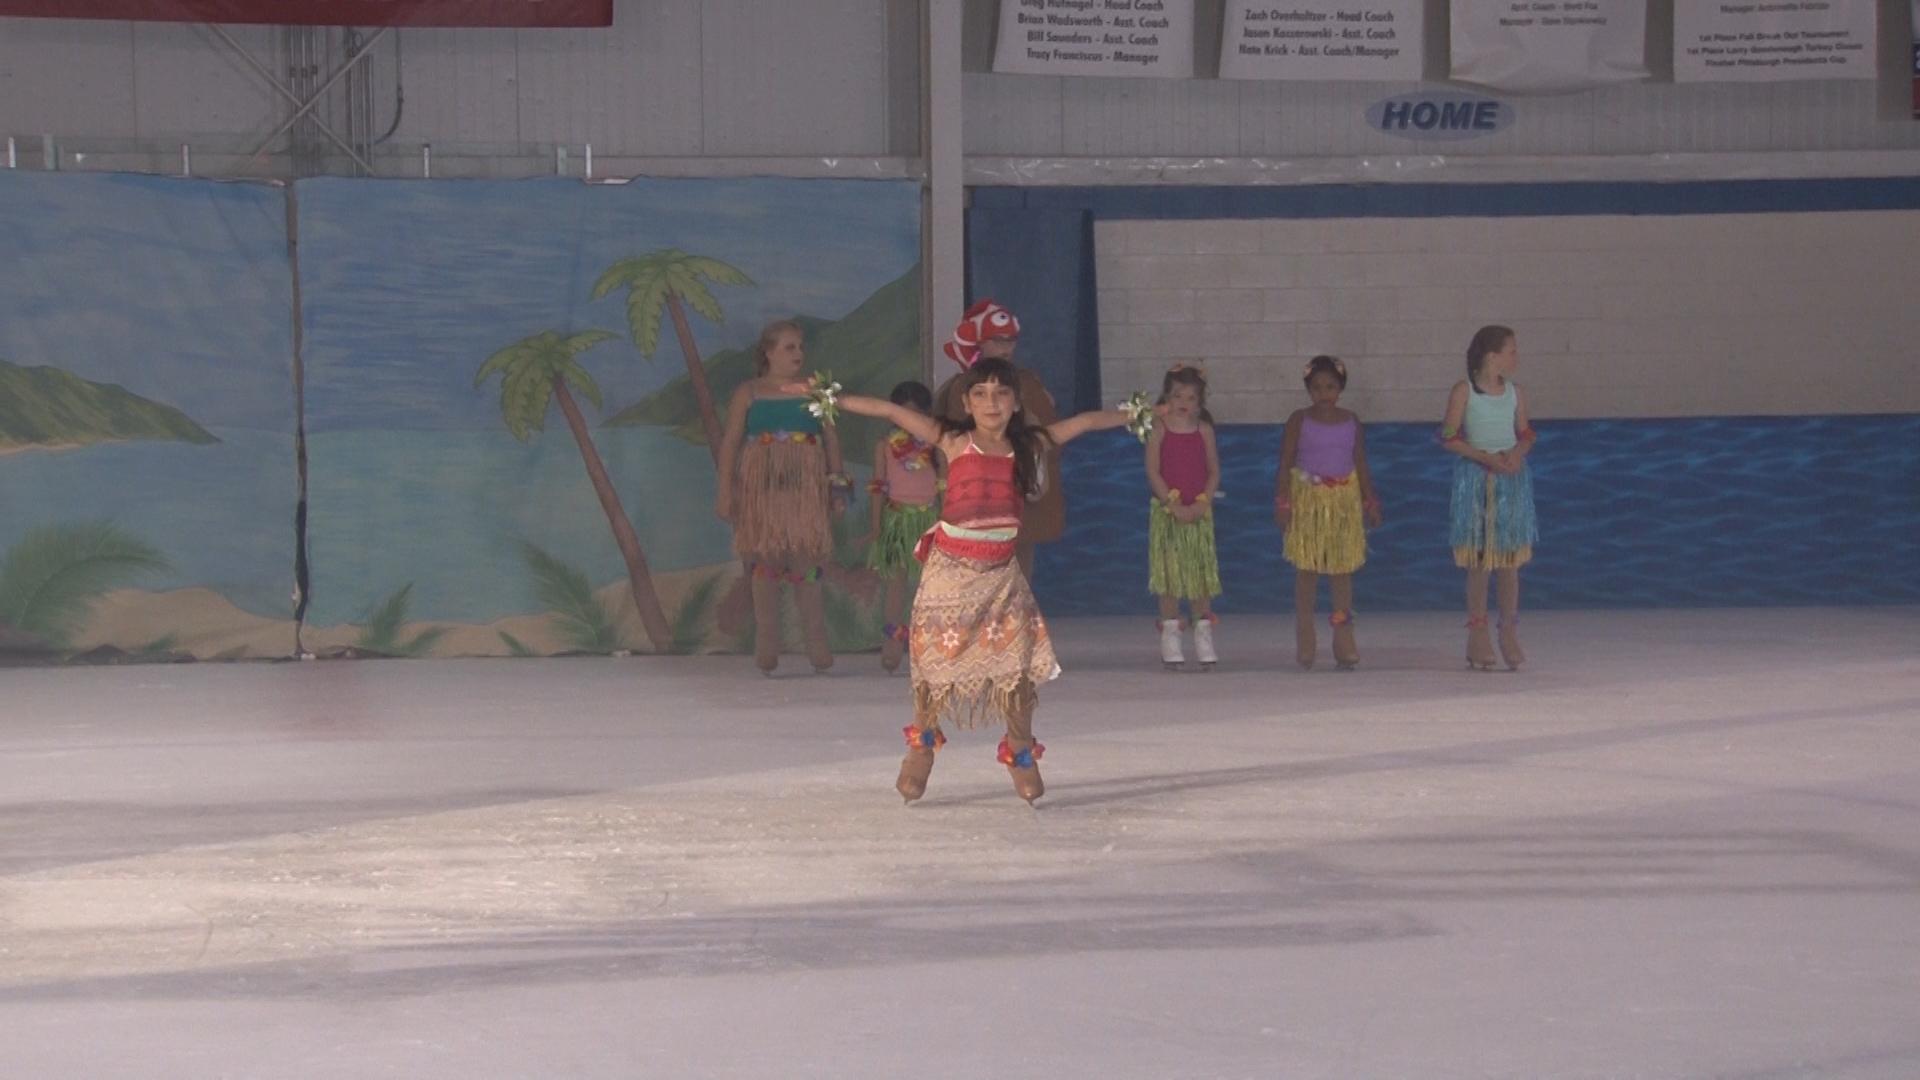 Power Play Maui Skate on Ice 071417.00_59_37_11.Still094.jpg